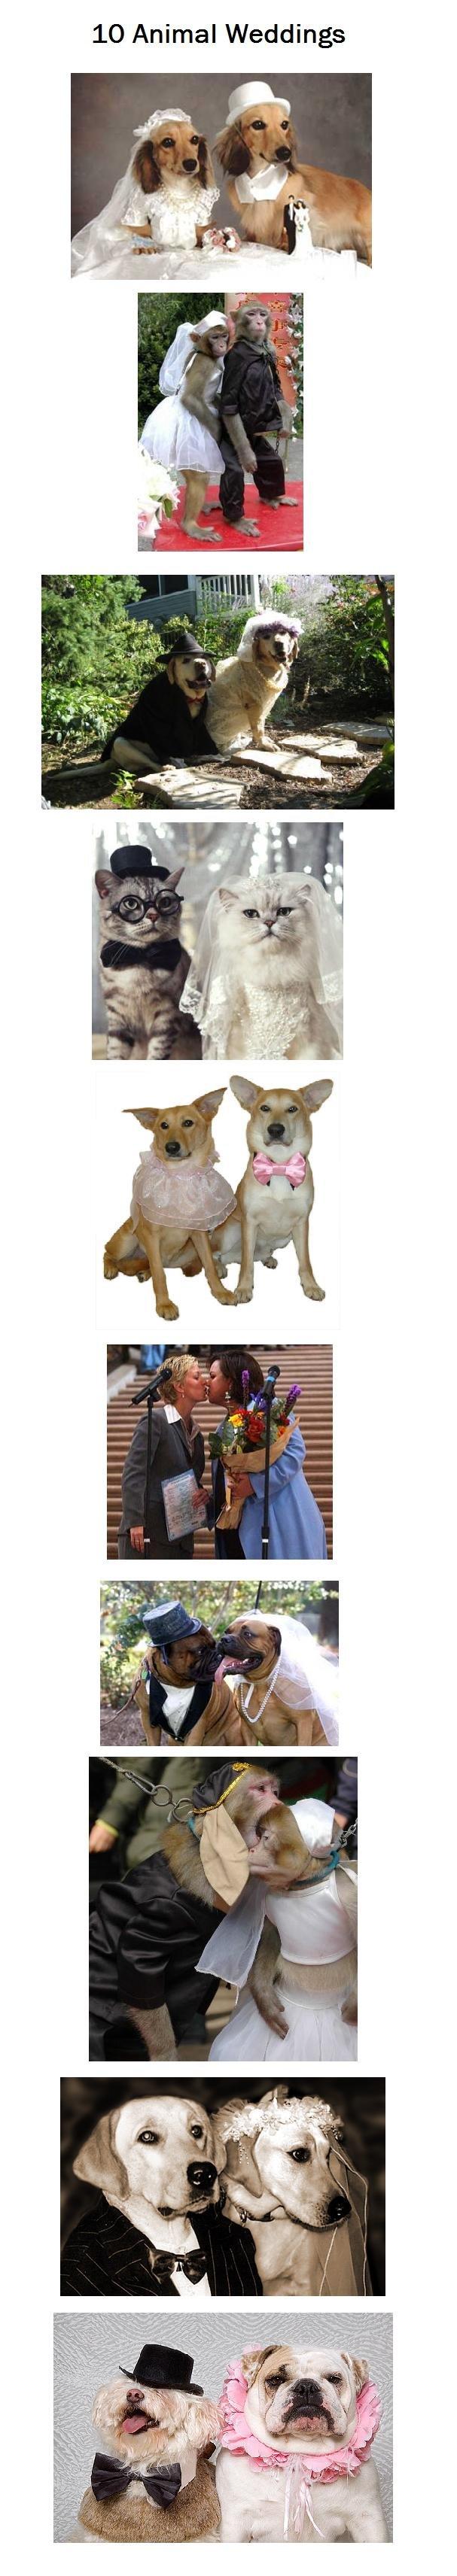 10 Animal Weddings. . 10 Animal Weddings. I love Rosie, In that last photo. Good Complitation